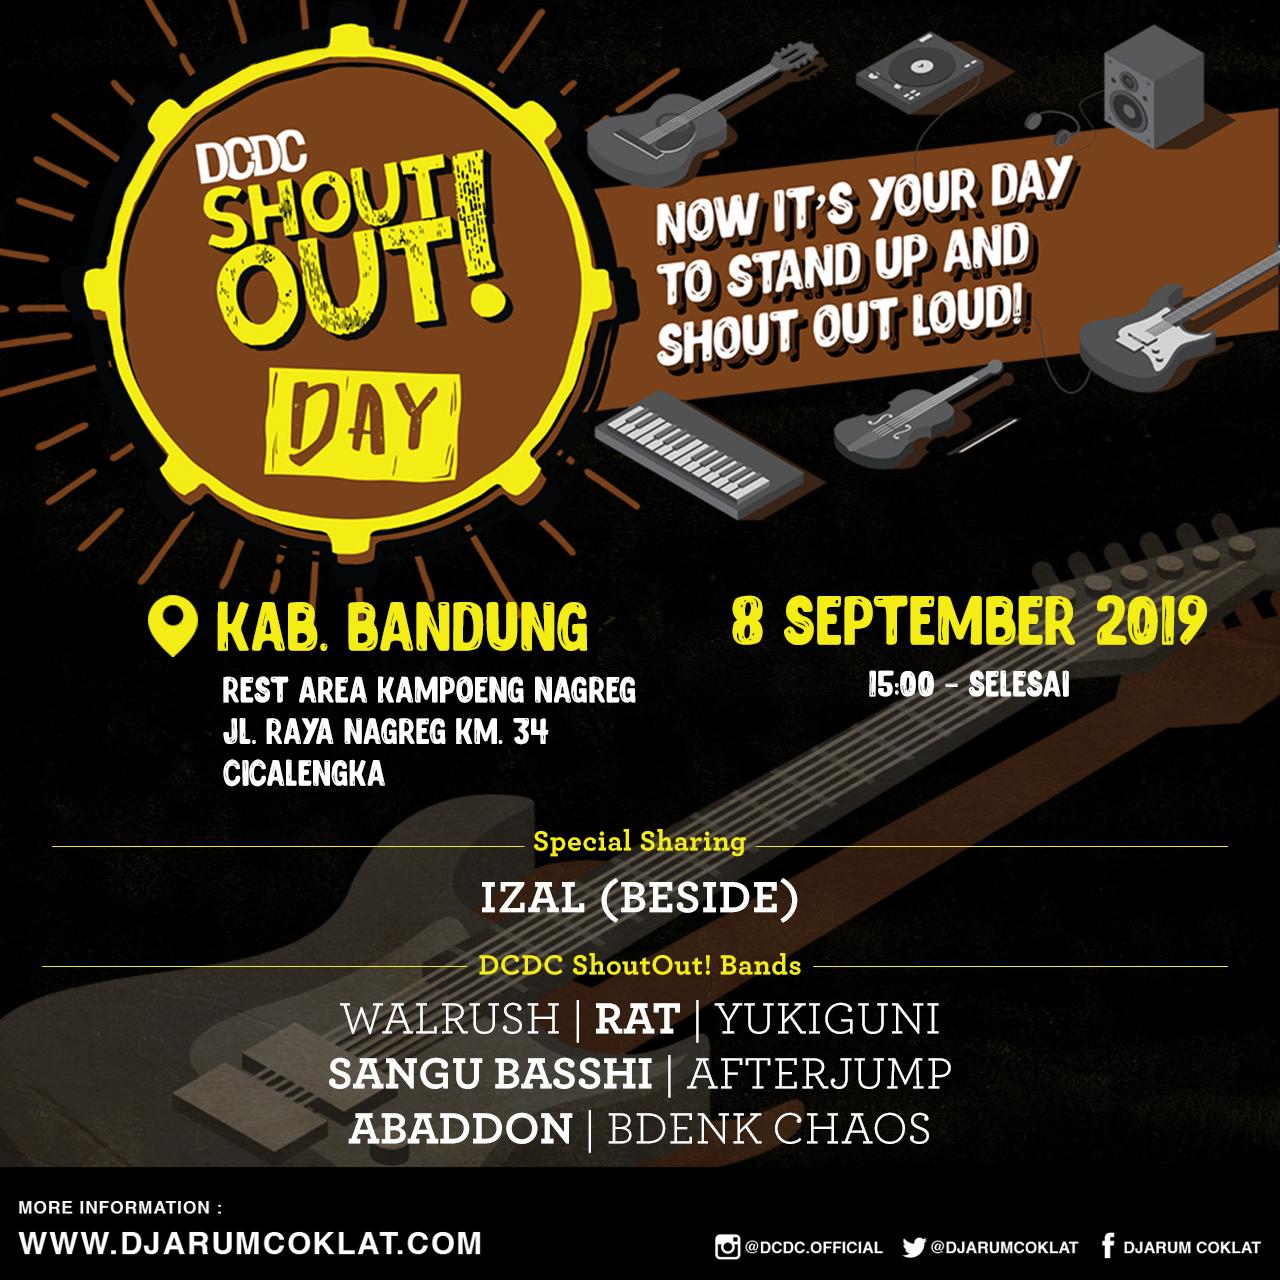 DCDC ShoutOut! Day - Kabupaten Bandung